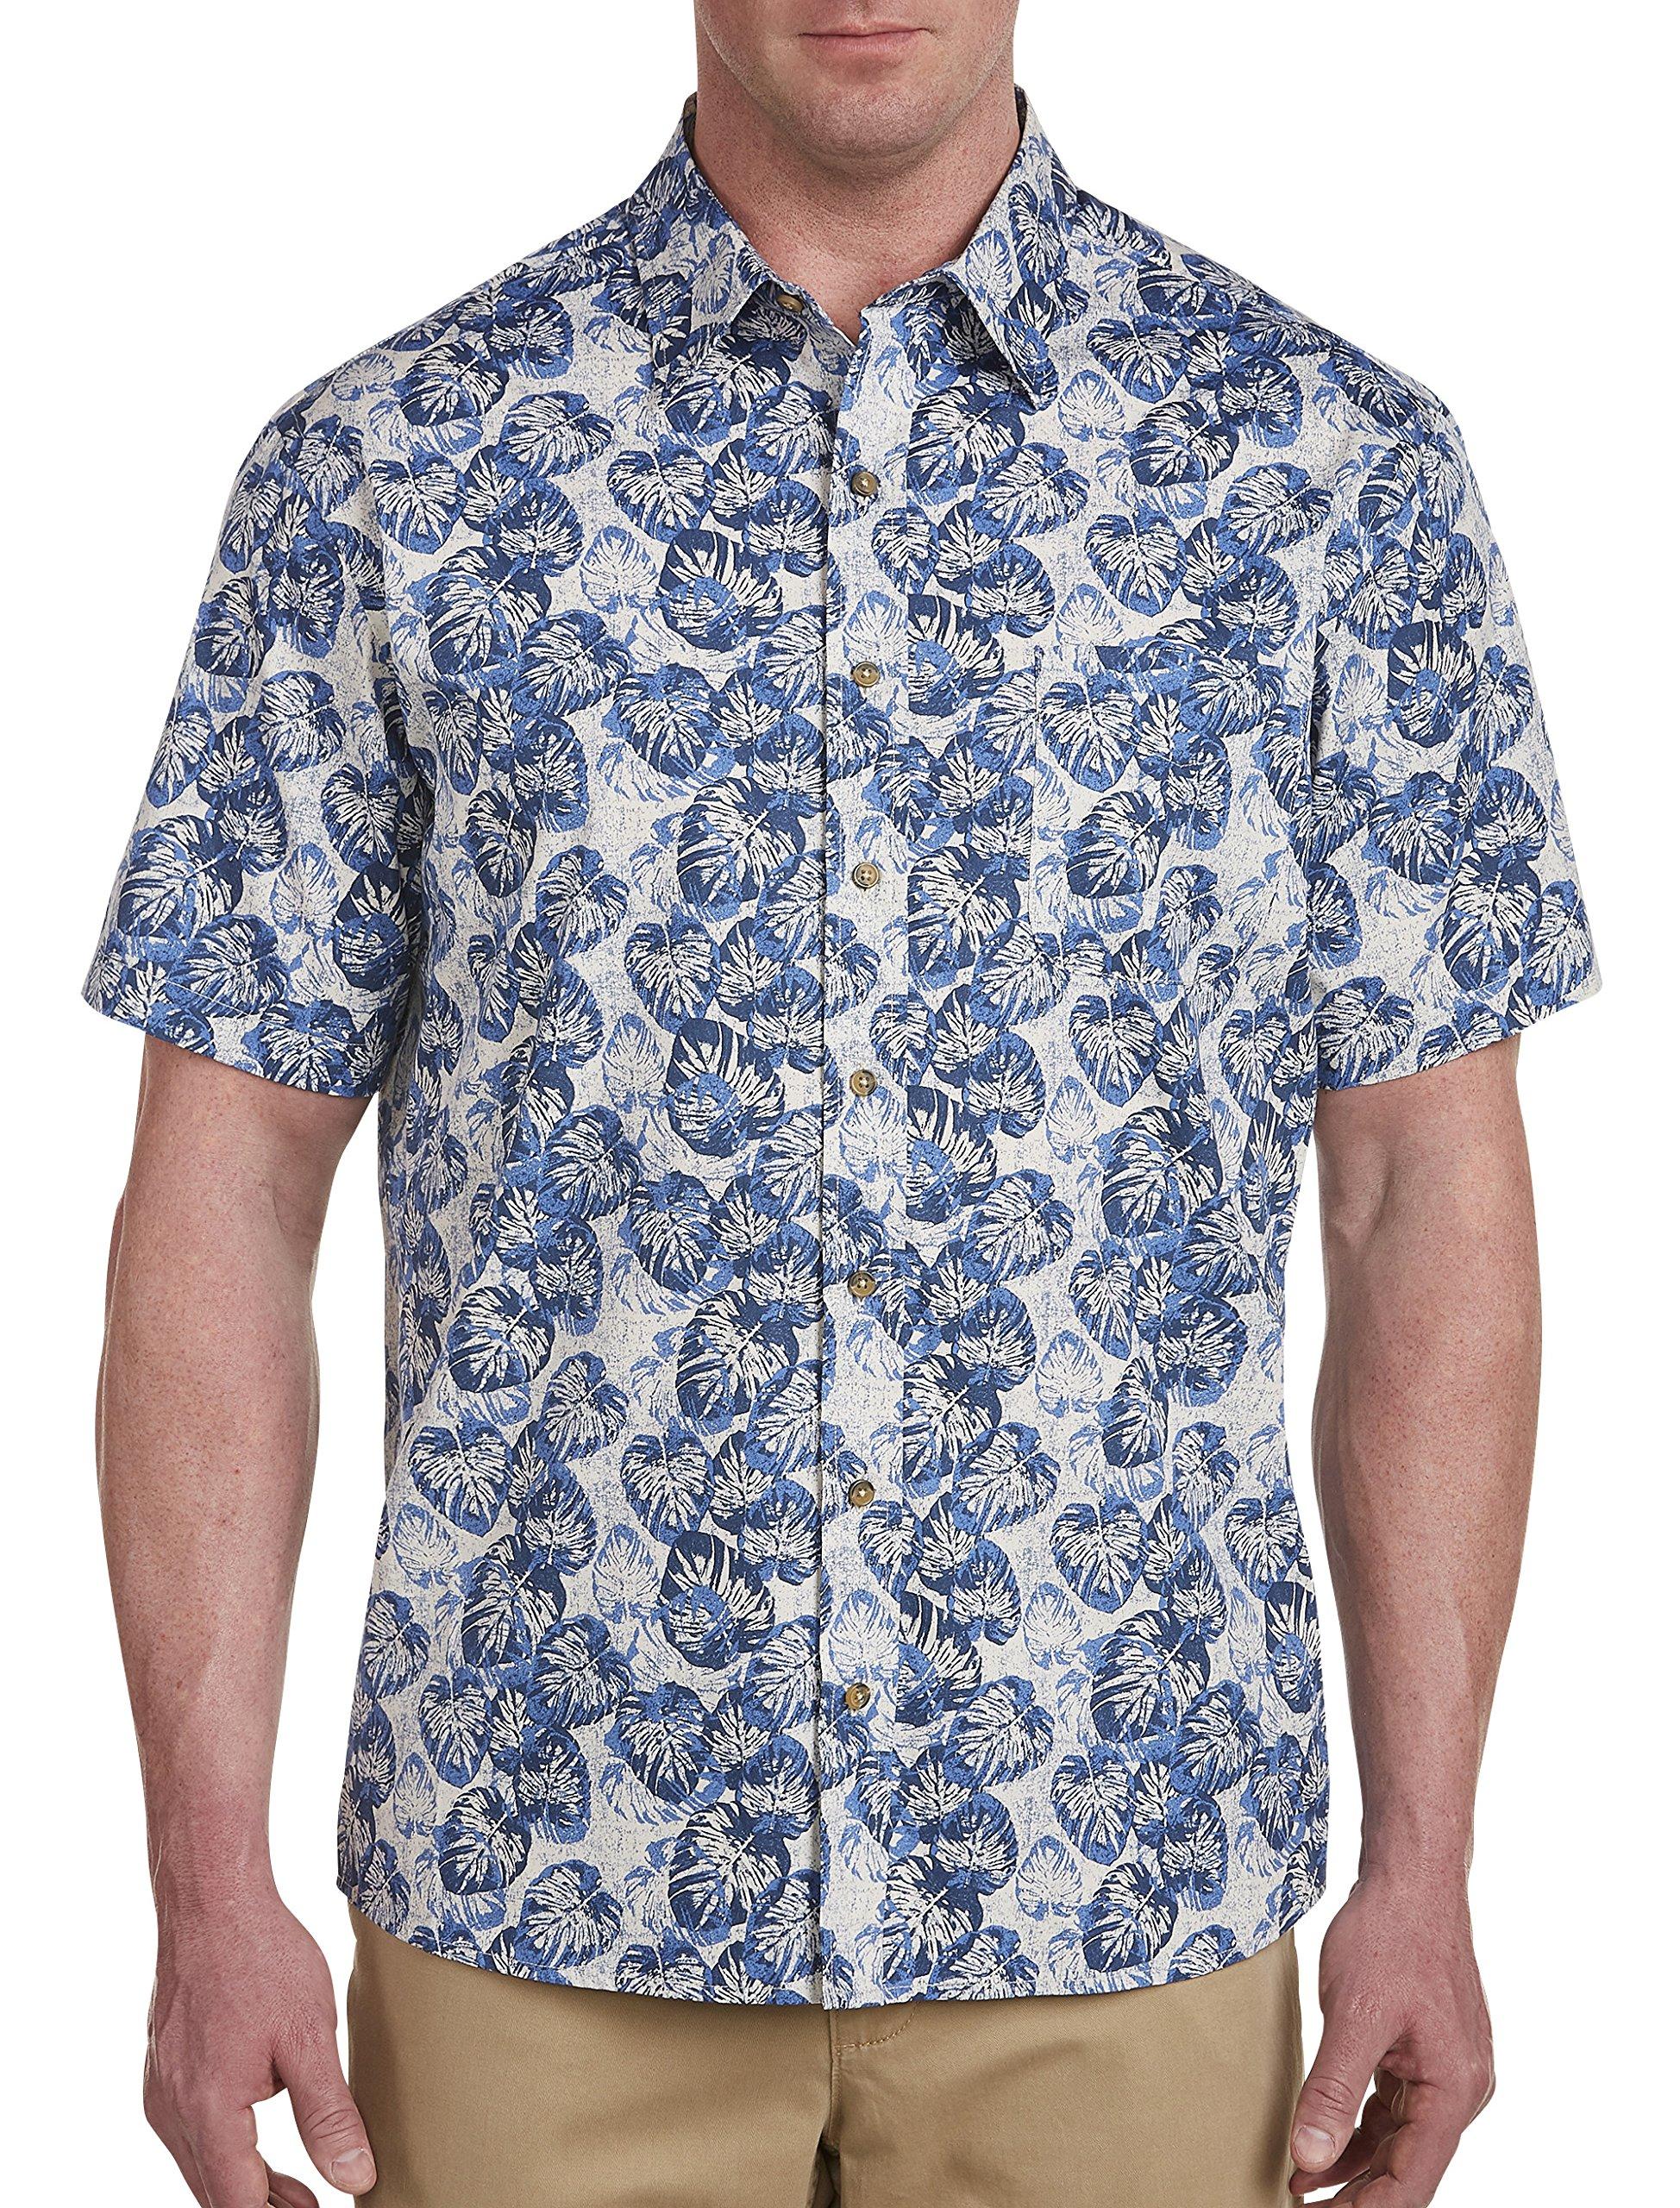 Harbor Bay by DXL Big and Tall Multi Leaf Print Sport Shirt